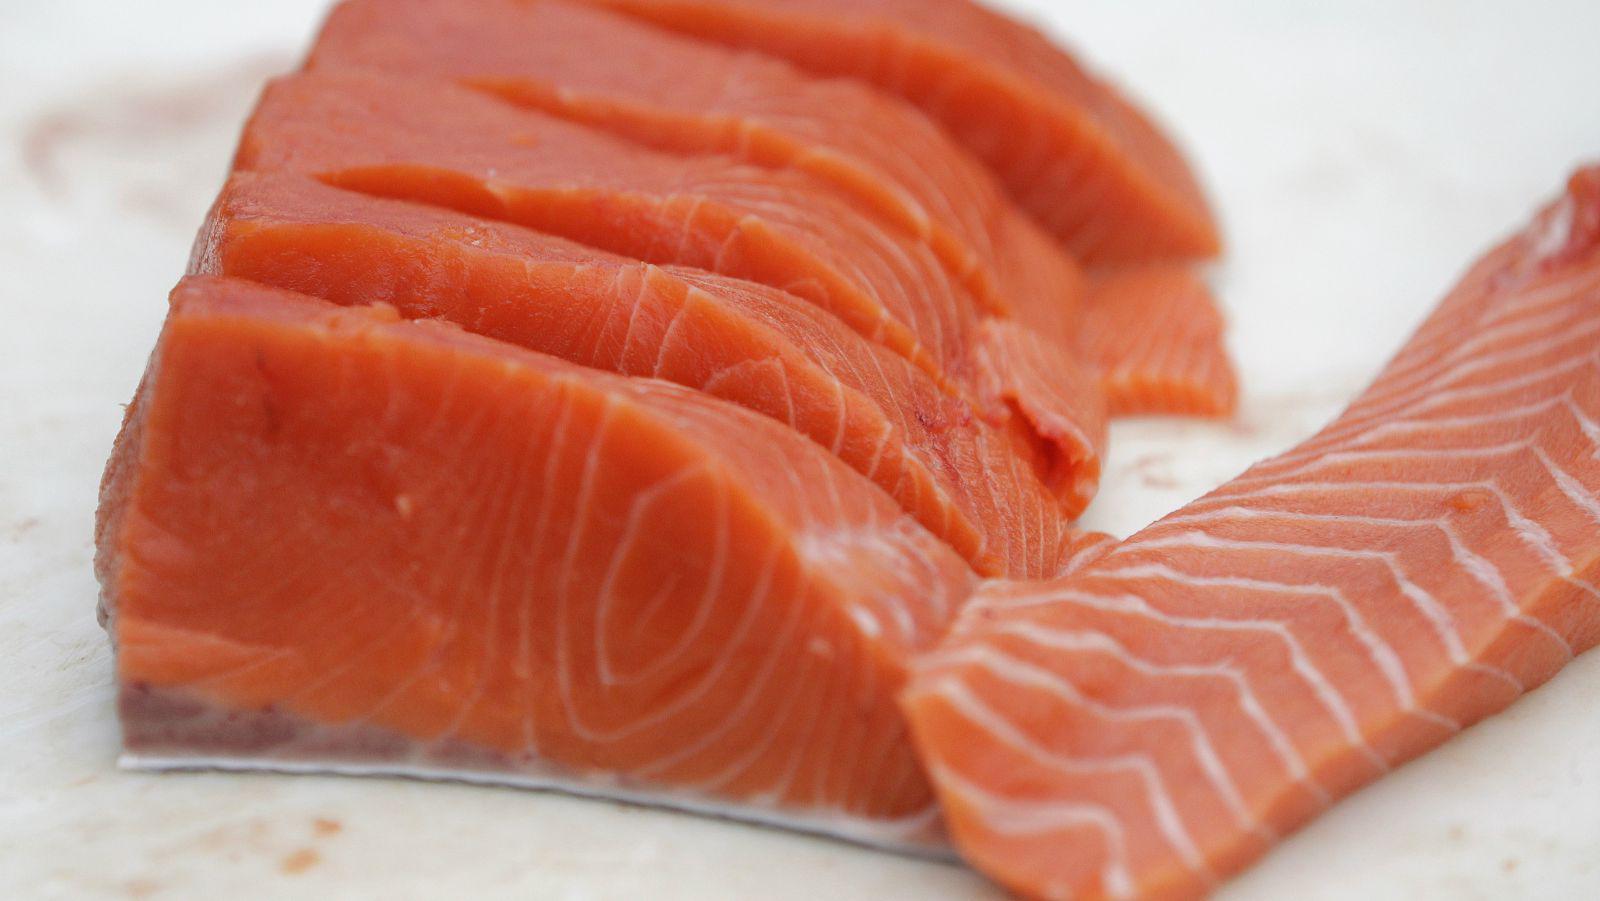 salmon-genetically-modified-gmo-2